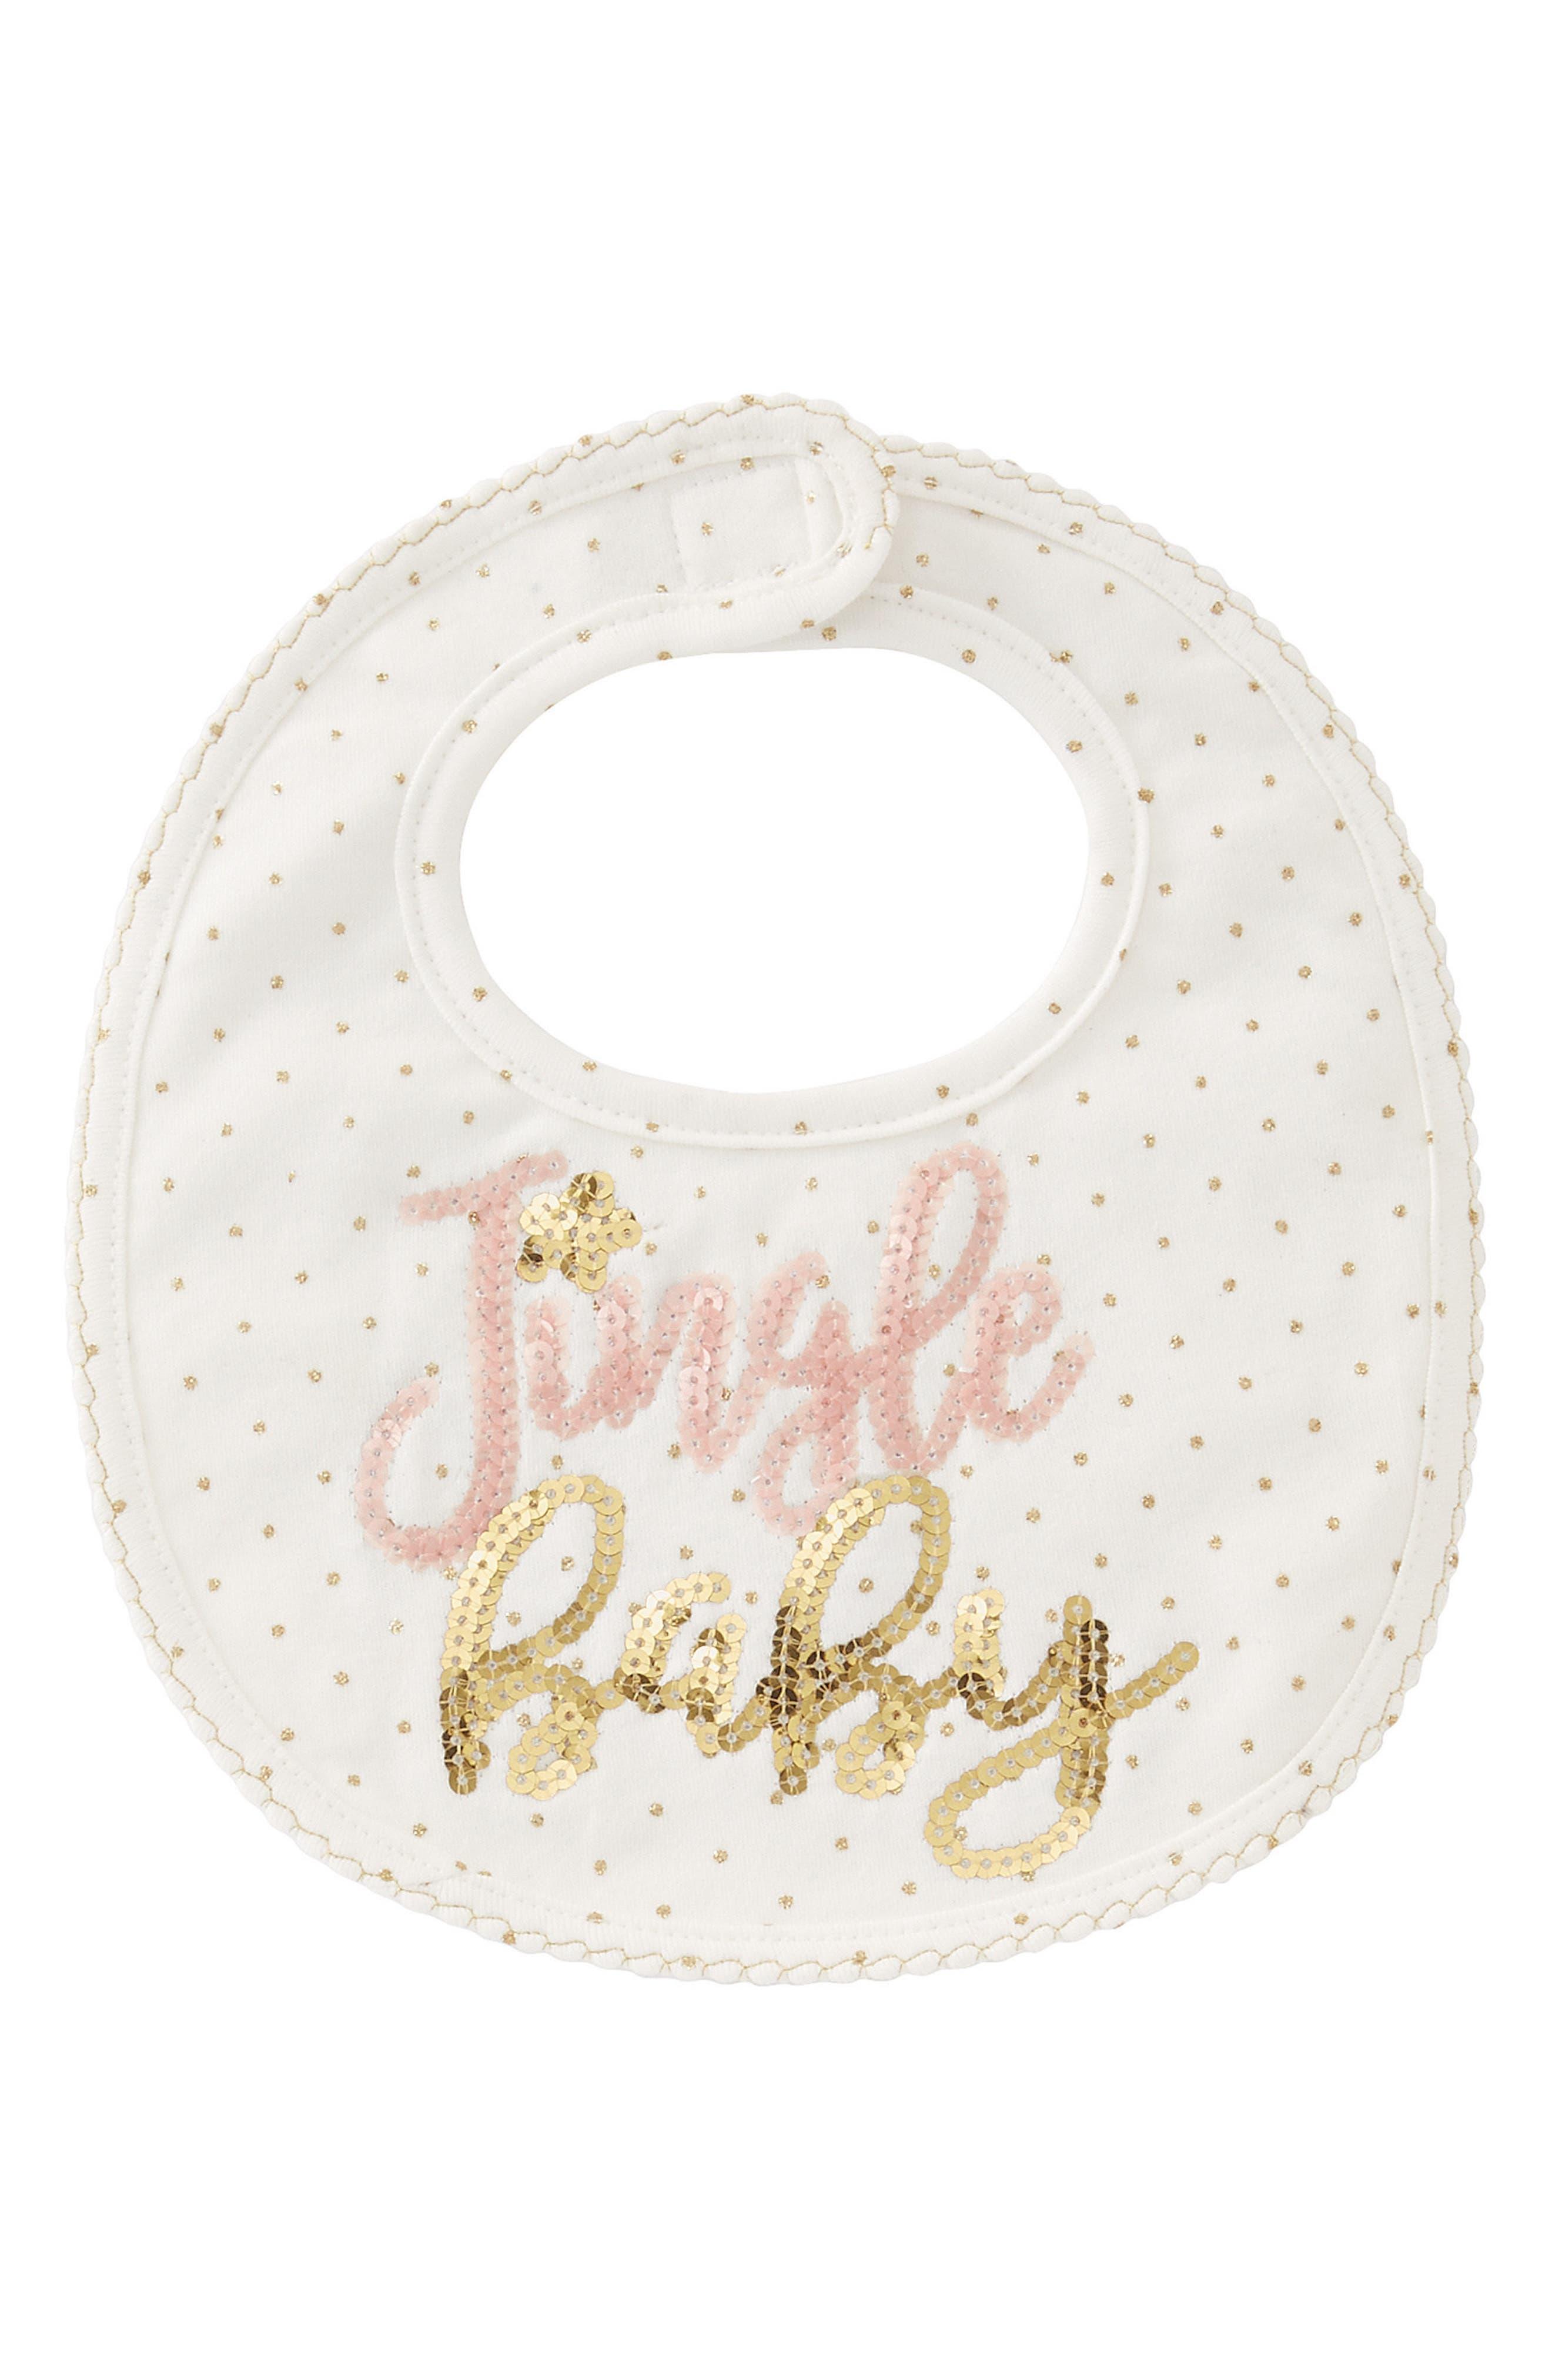 Jingle Baby Bib,                         Main,                         color, White